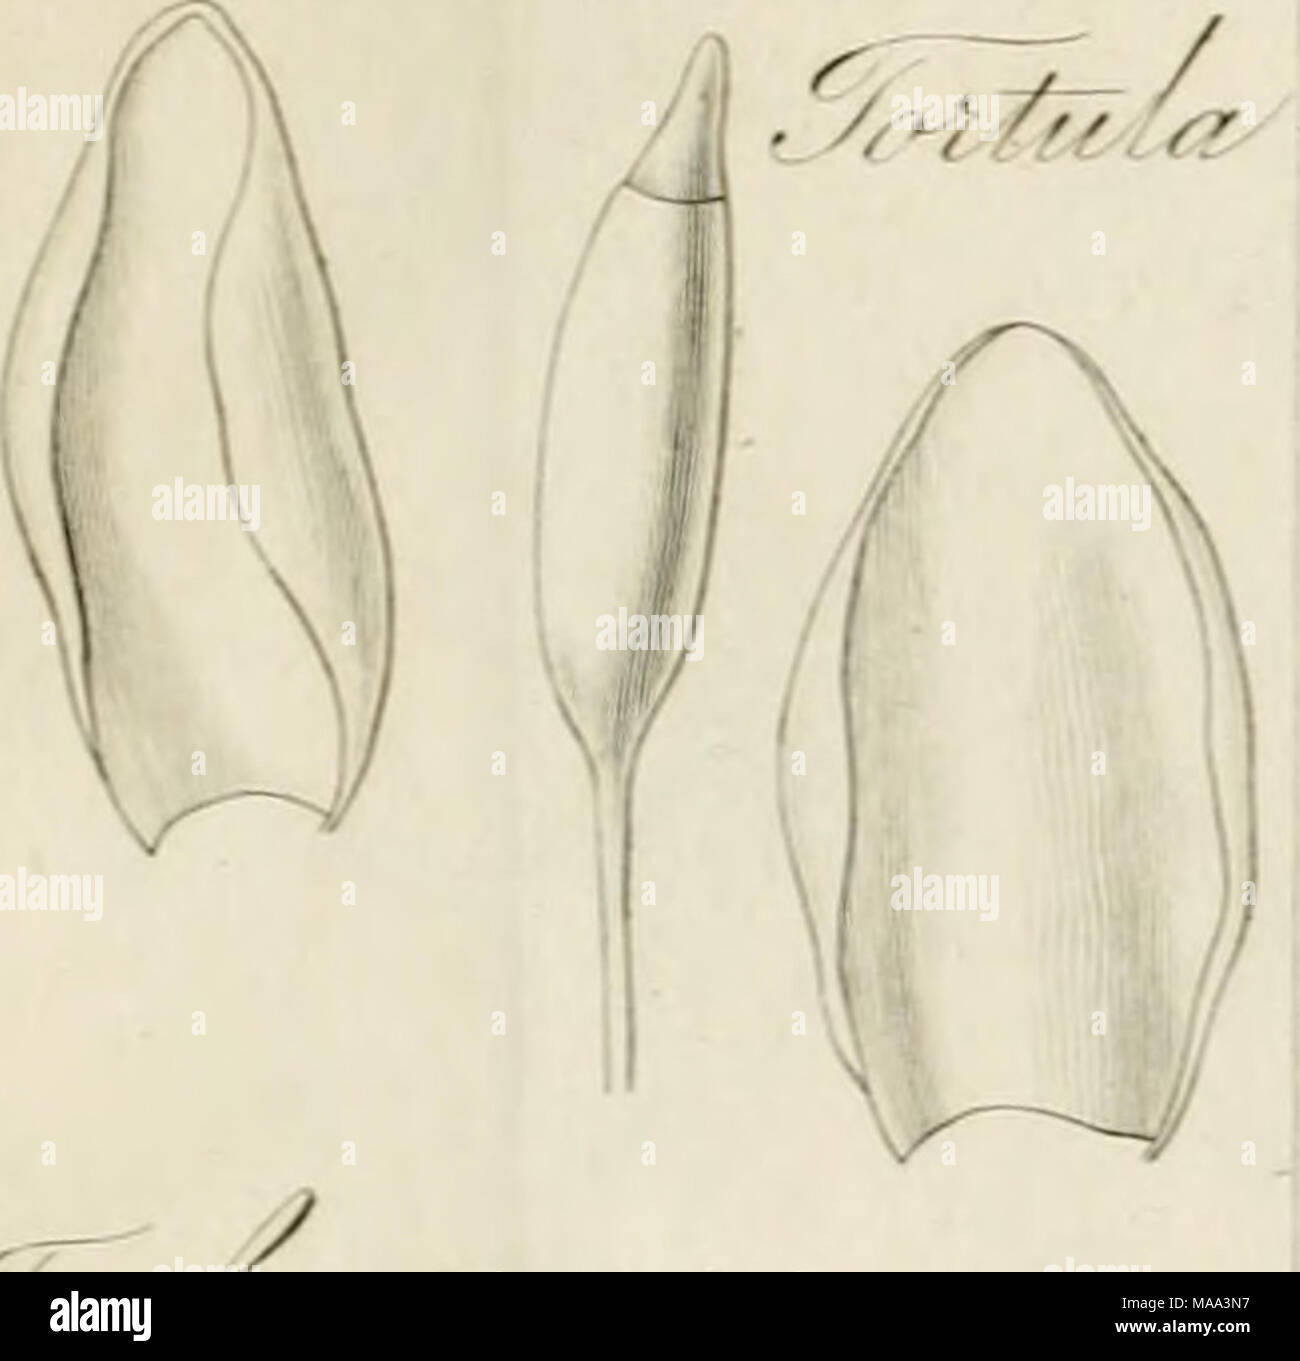 . The Edinburgh journal of science. v. 1-10, July 1824-Apr. 1829; new ser., v. 1-6, July 1829-Apr. 1832 . •lJ. ^Mnt^iMj^ Stock Photo